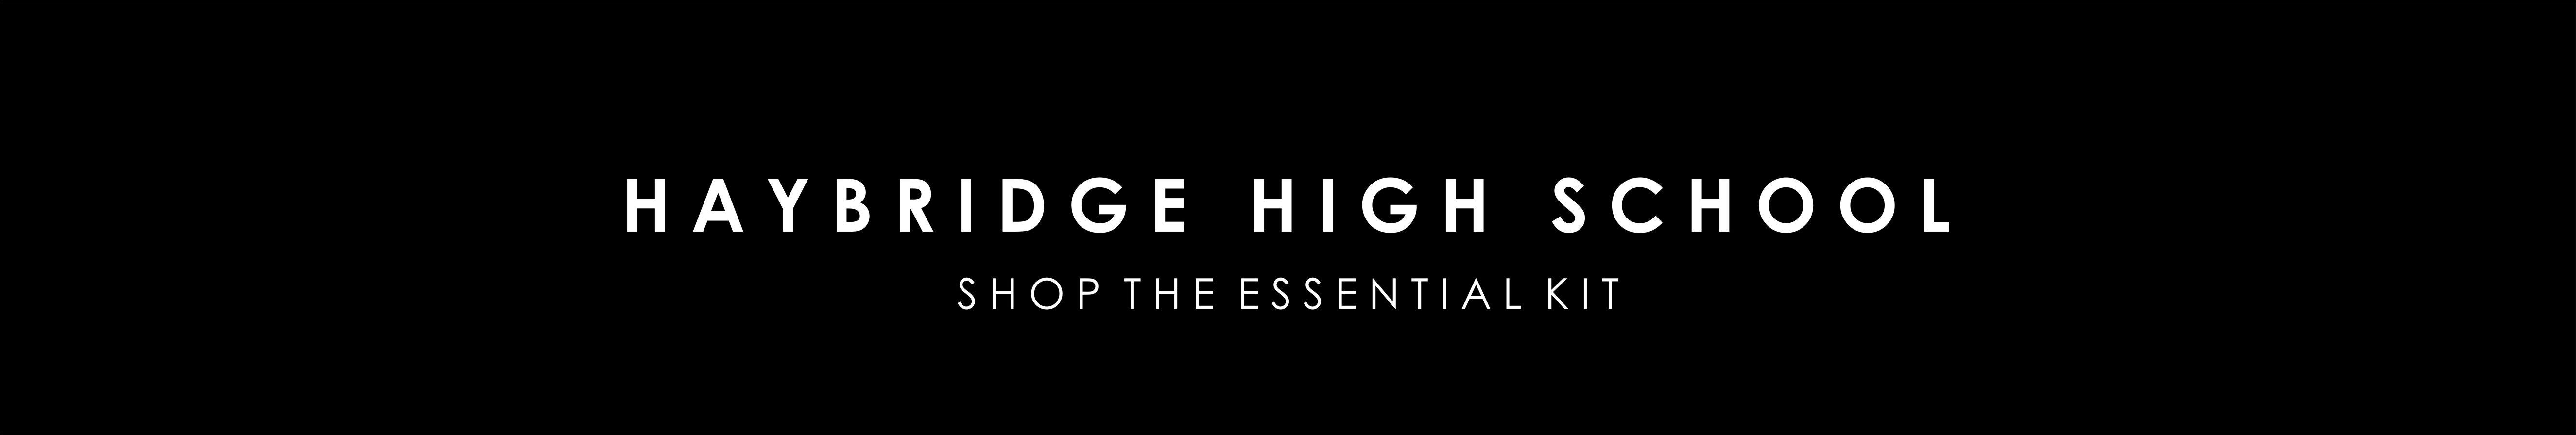 haybridge-high-school-banner-main-page.jpg